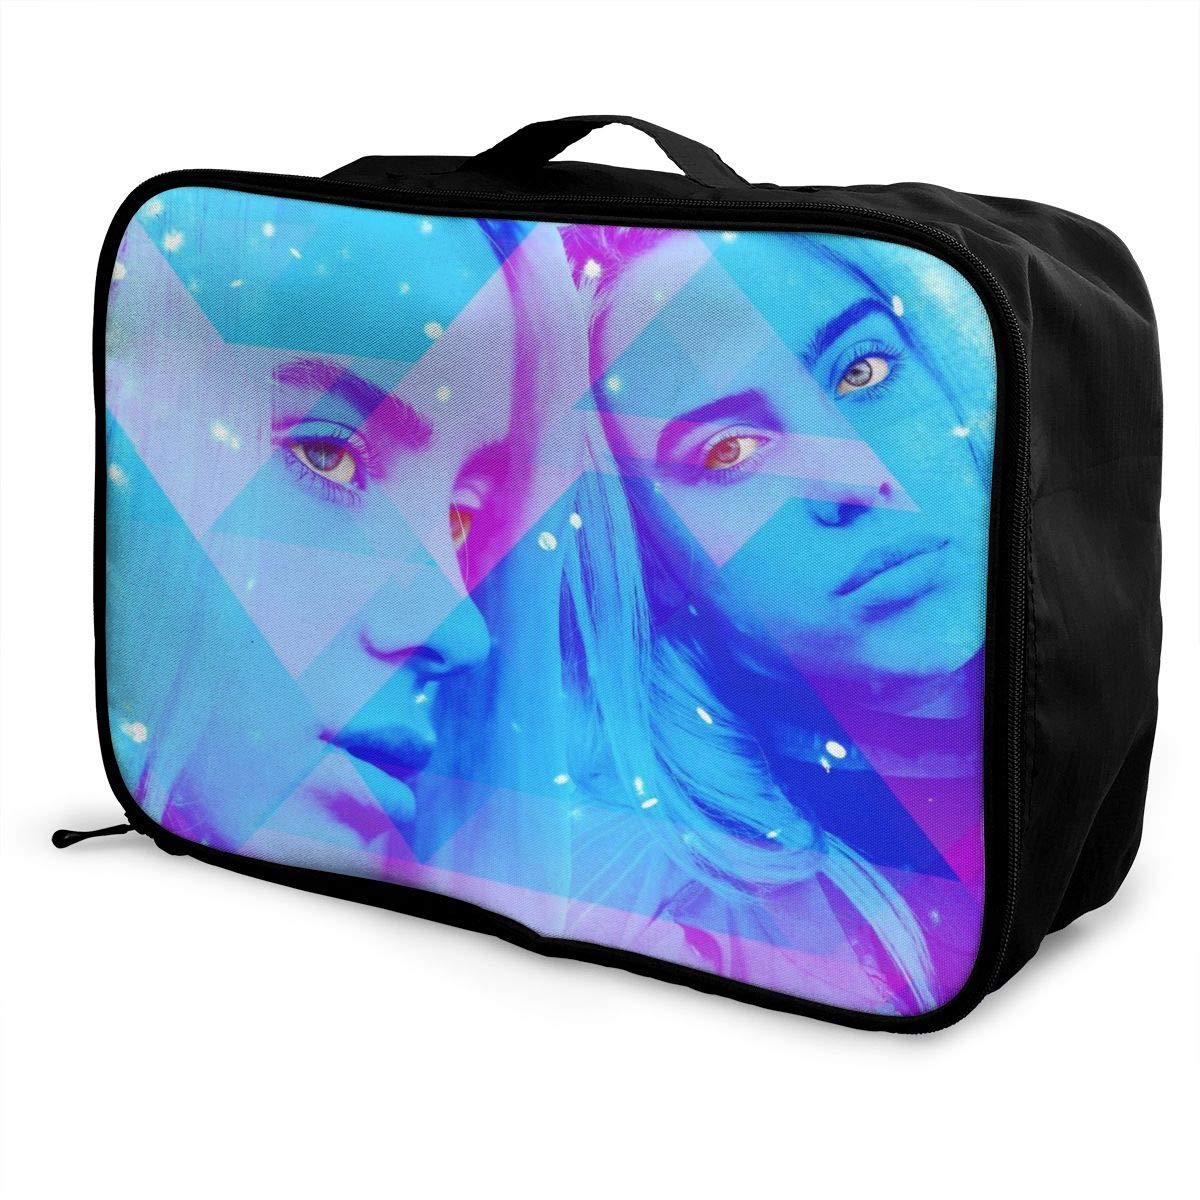 Billie-Eilish/_Getty/_Ringer Lightweight Large Capacity Portable Luggage Bag Travel Foldable Duffel Bag Women Men